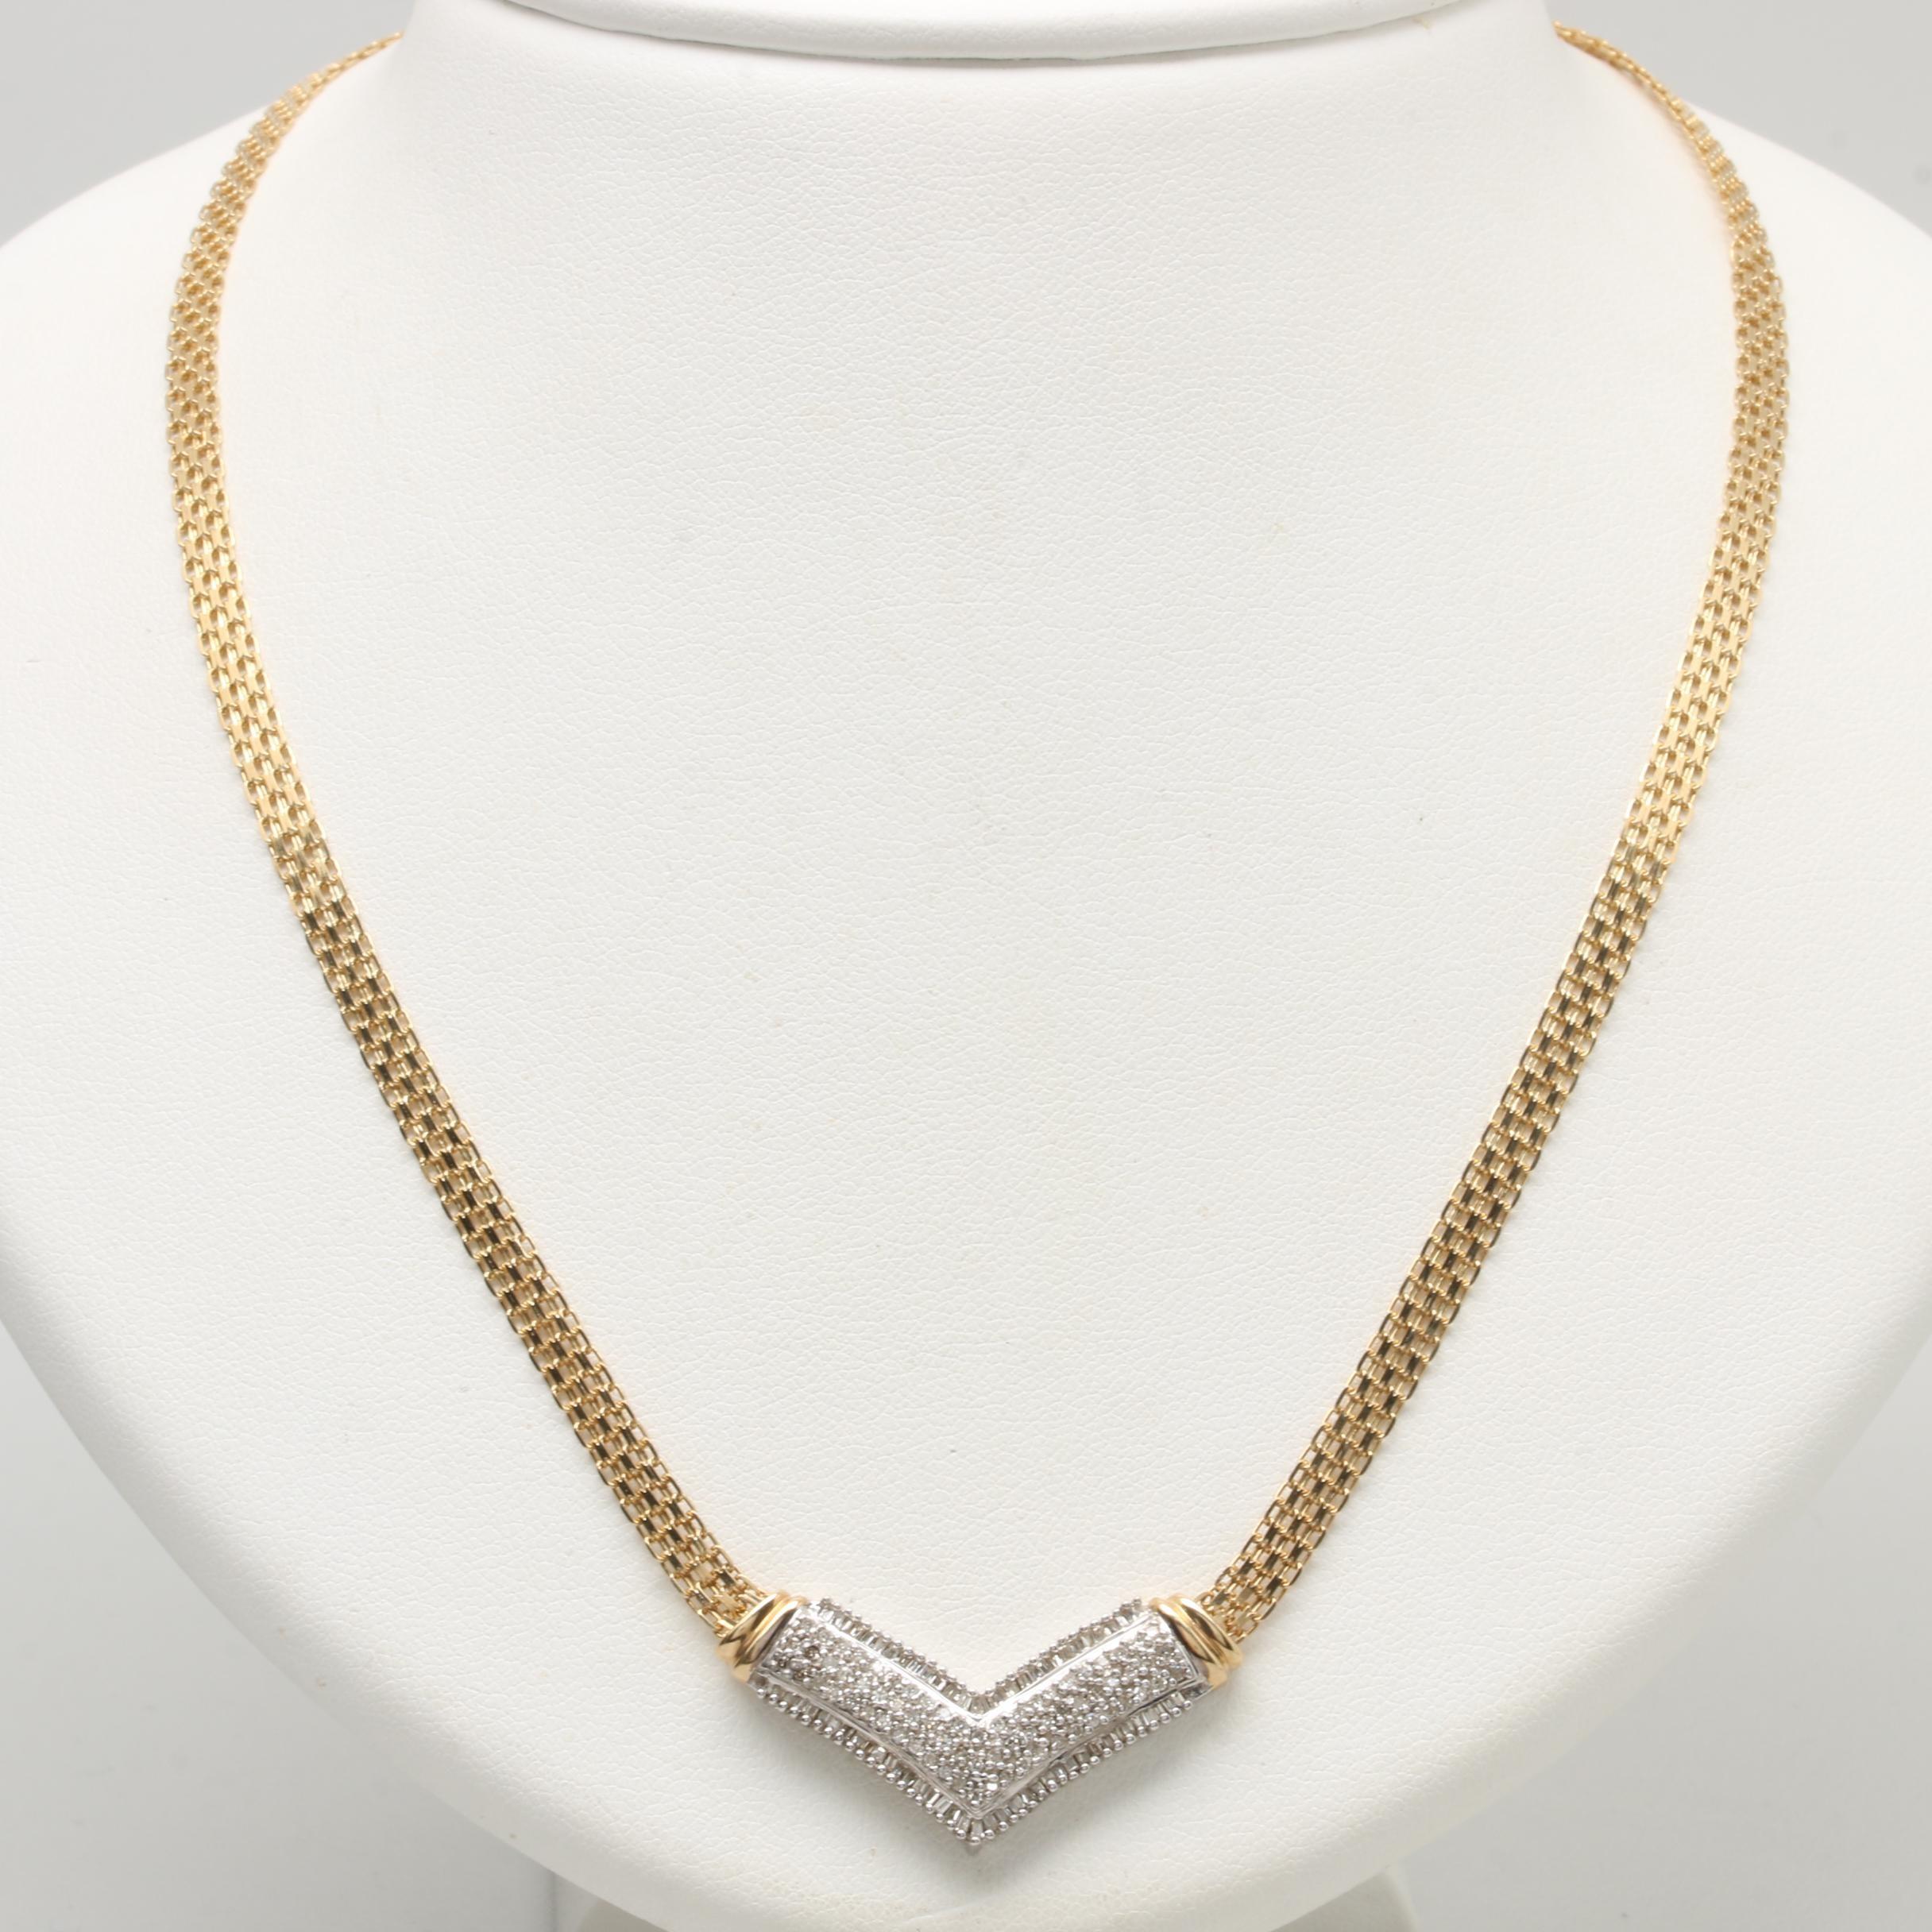 10K Yellow Gold Diamond Chevron Necklace